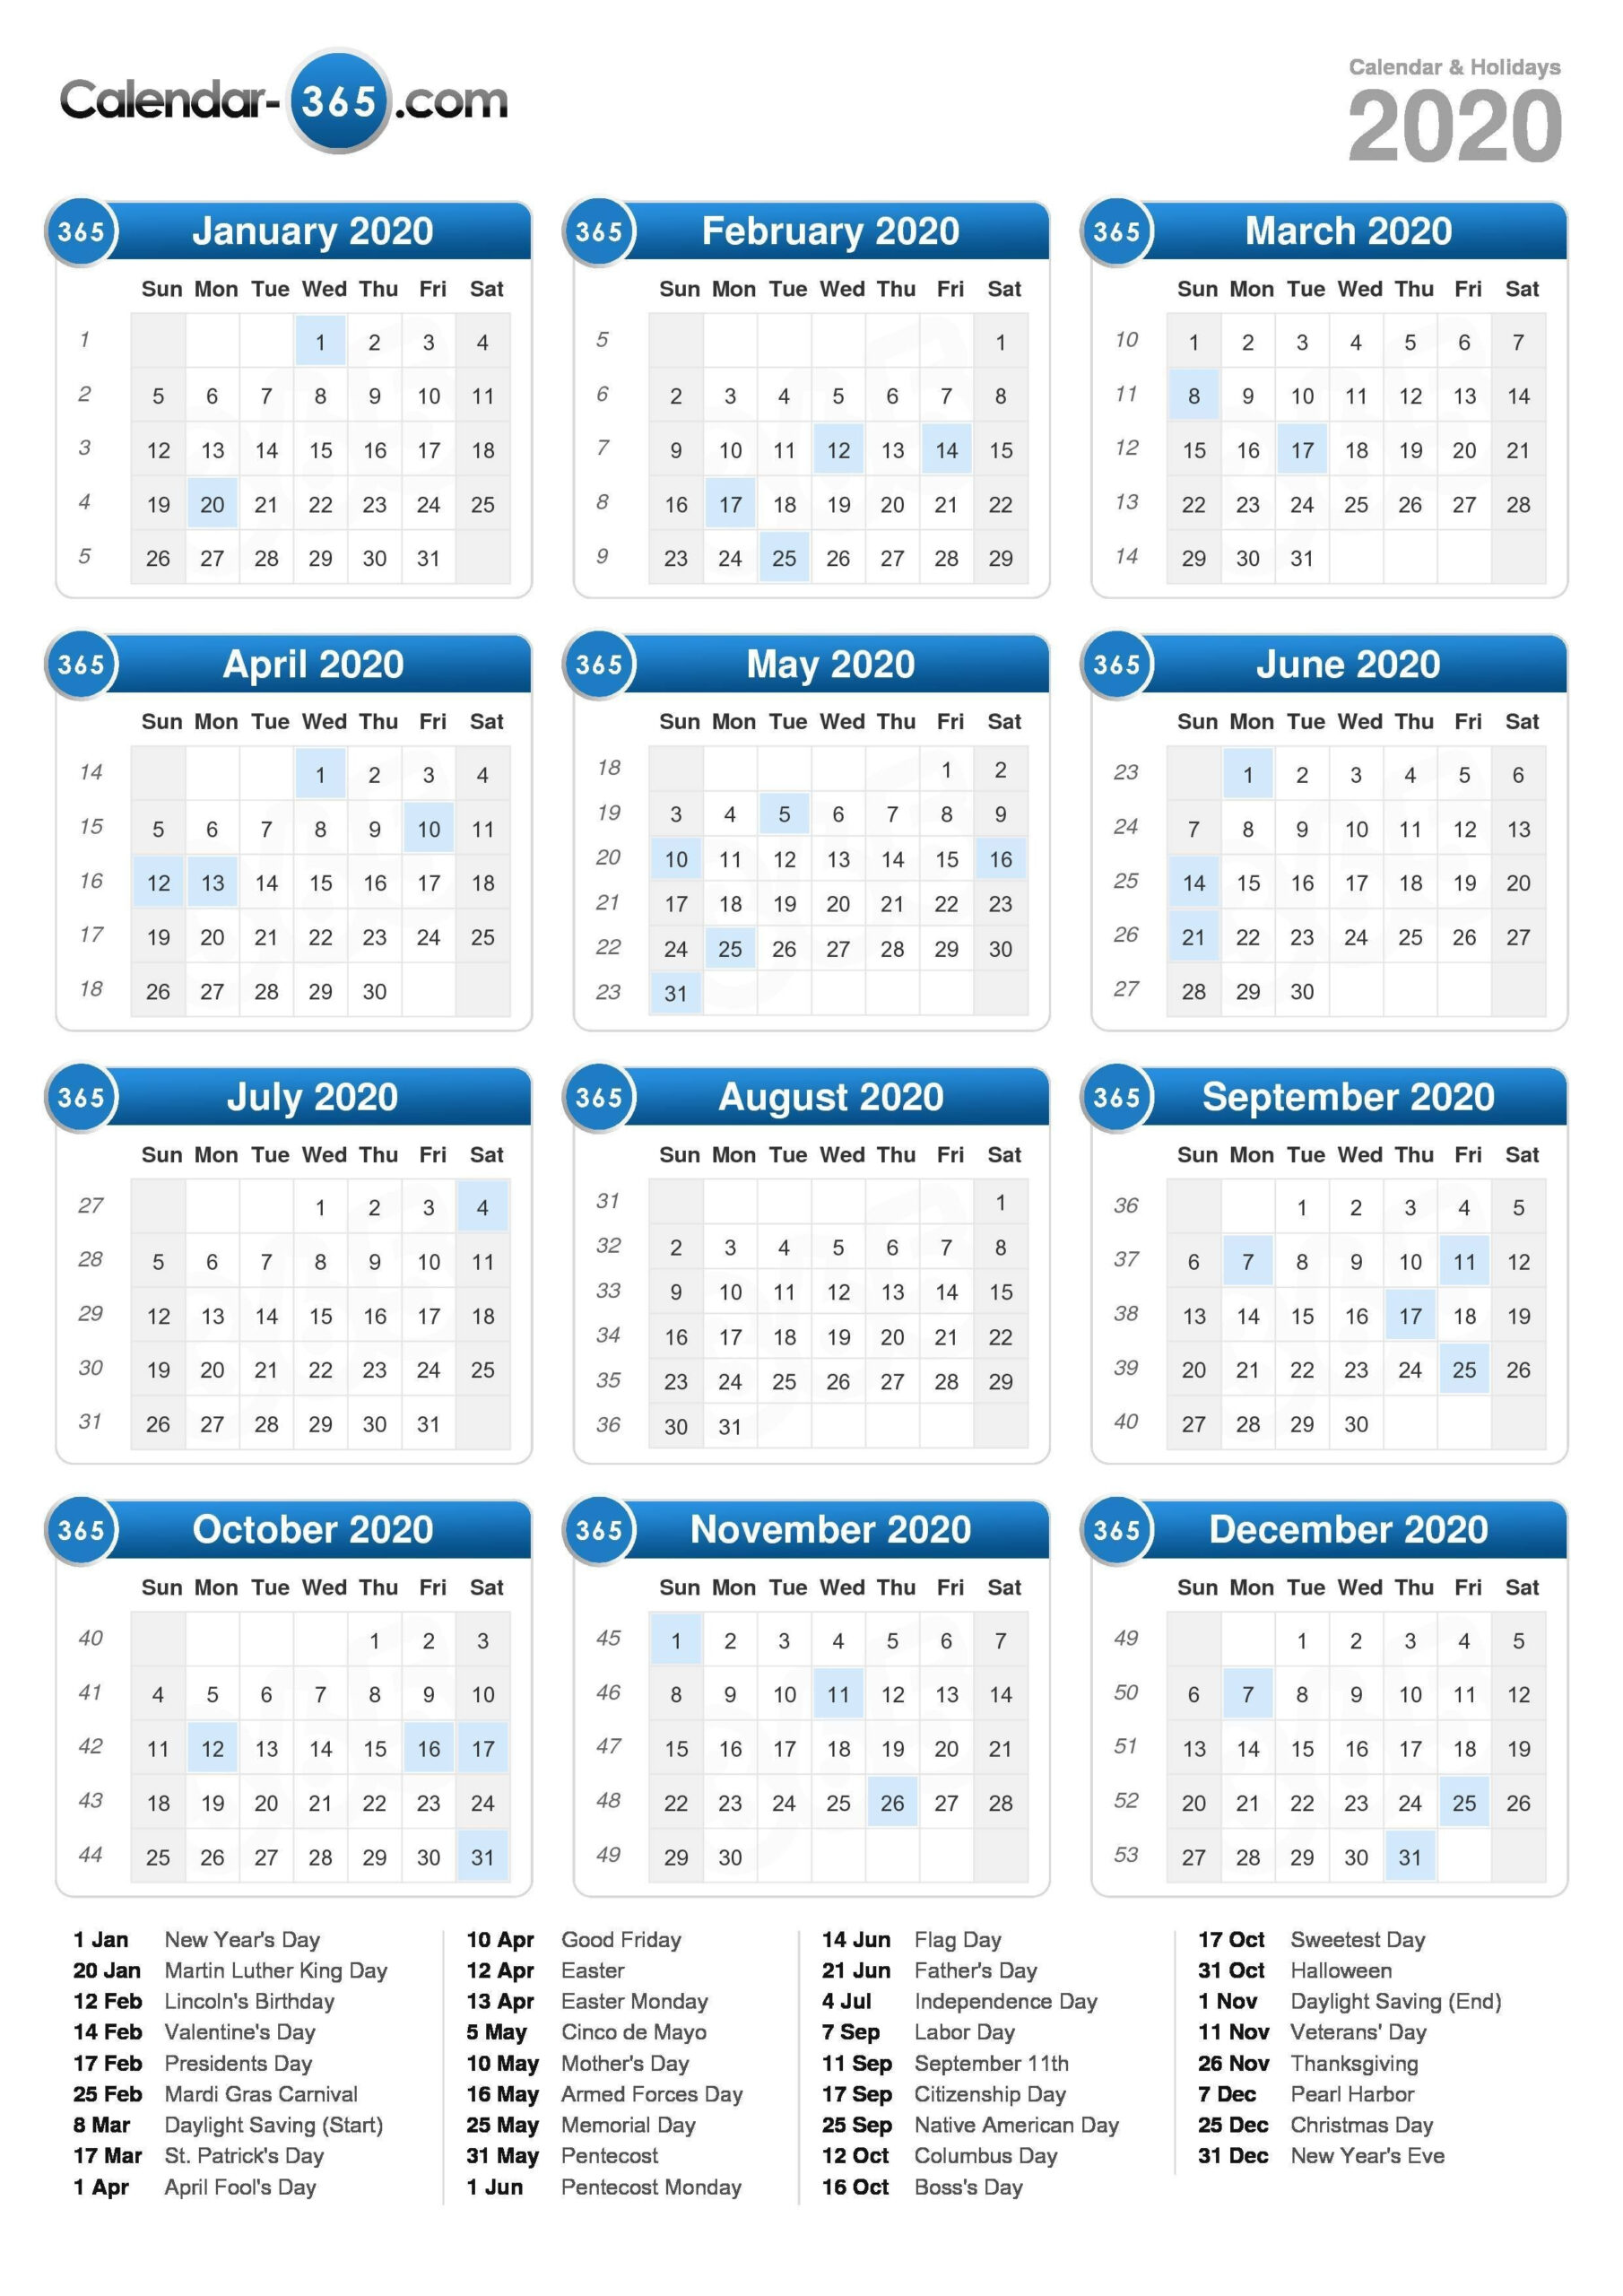 4-5-4 Calendar 2019 :-Free Calendar Template within Retail Calendar 2022 4-5-4 Explained